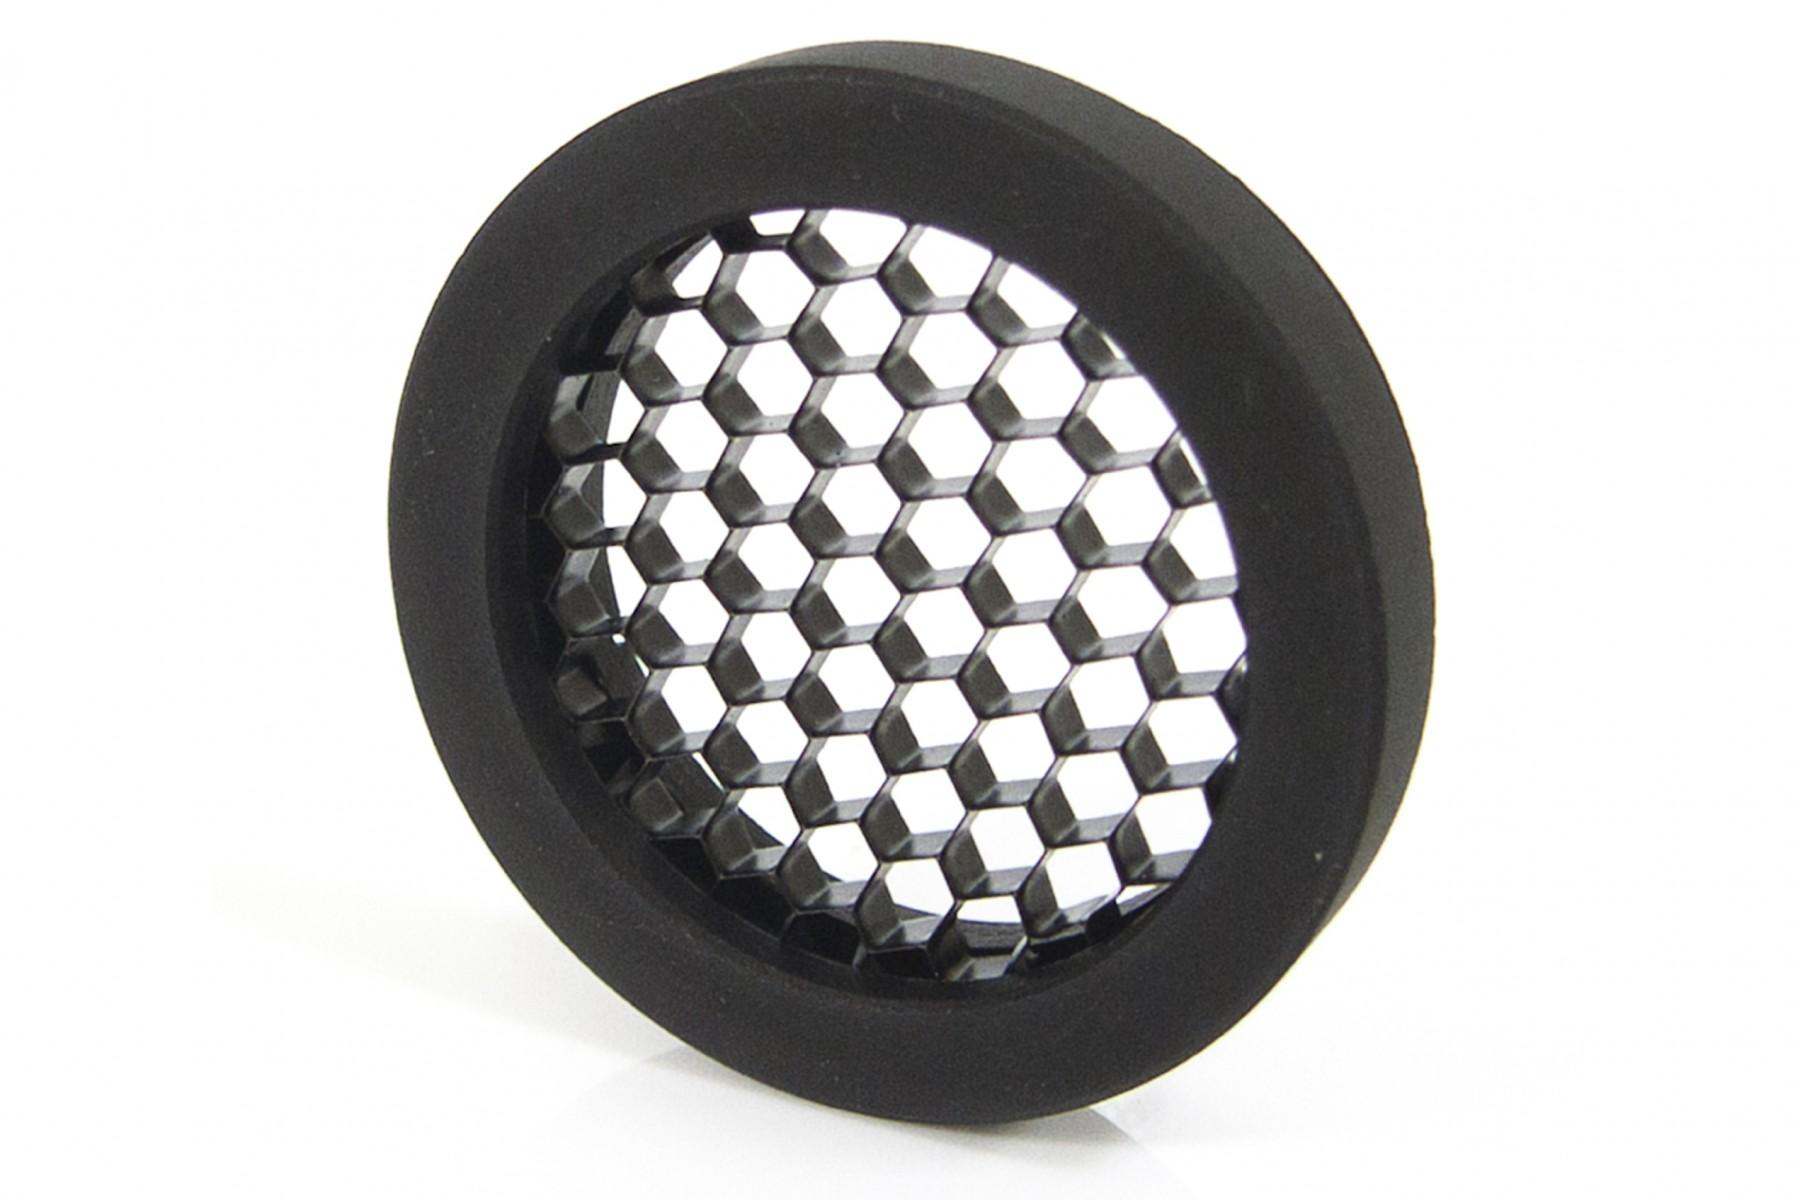 Nuprol 32MM KILLFLASH product image